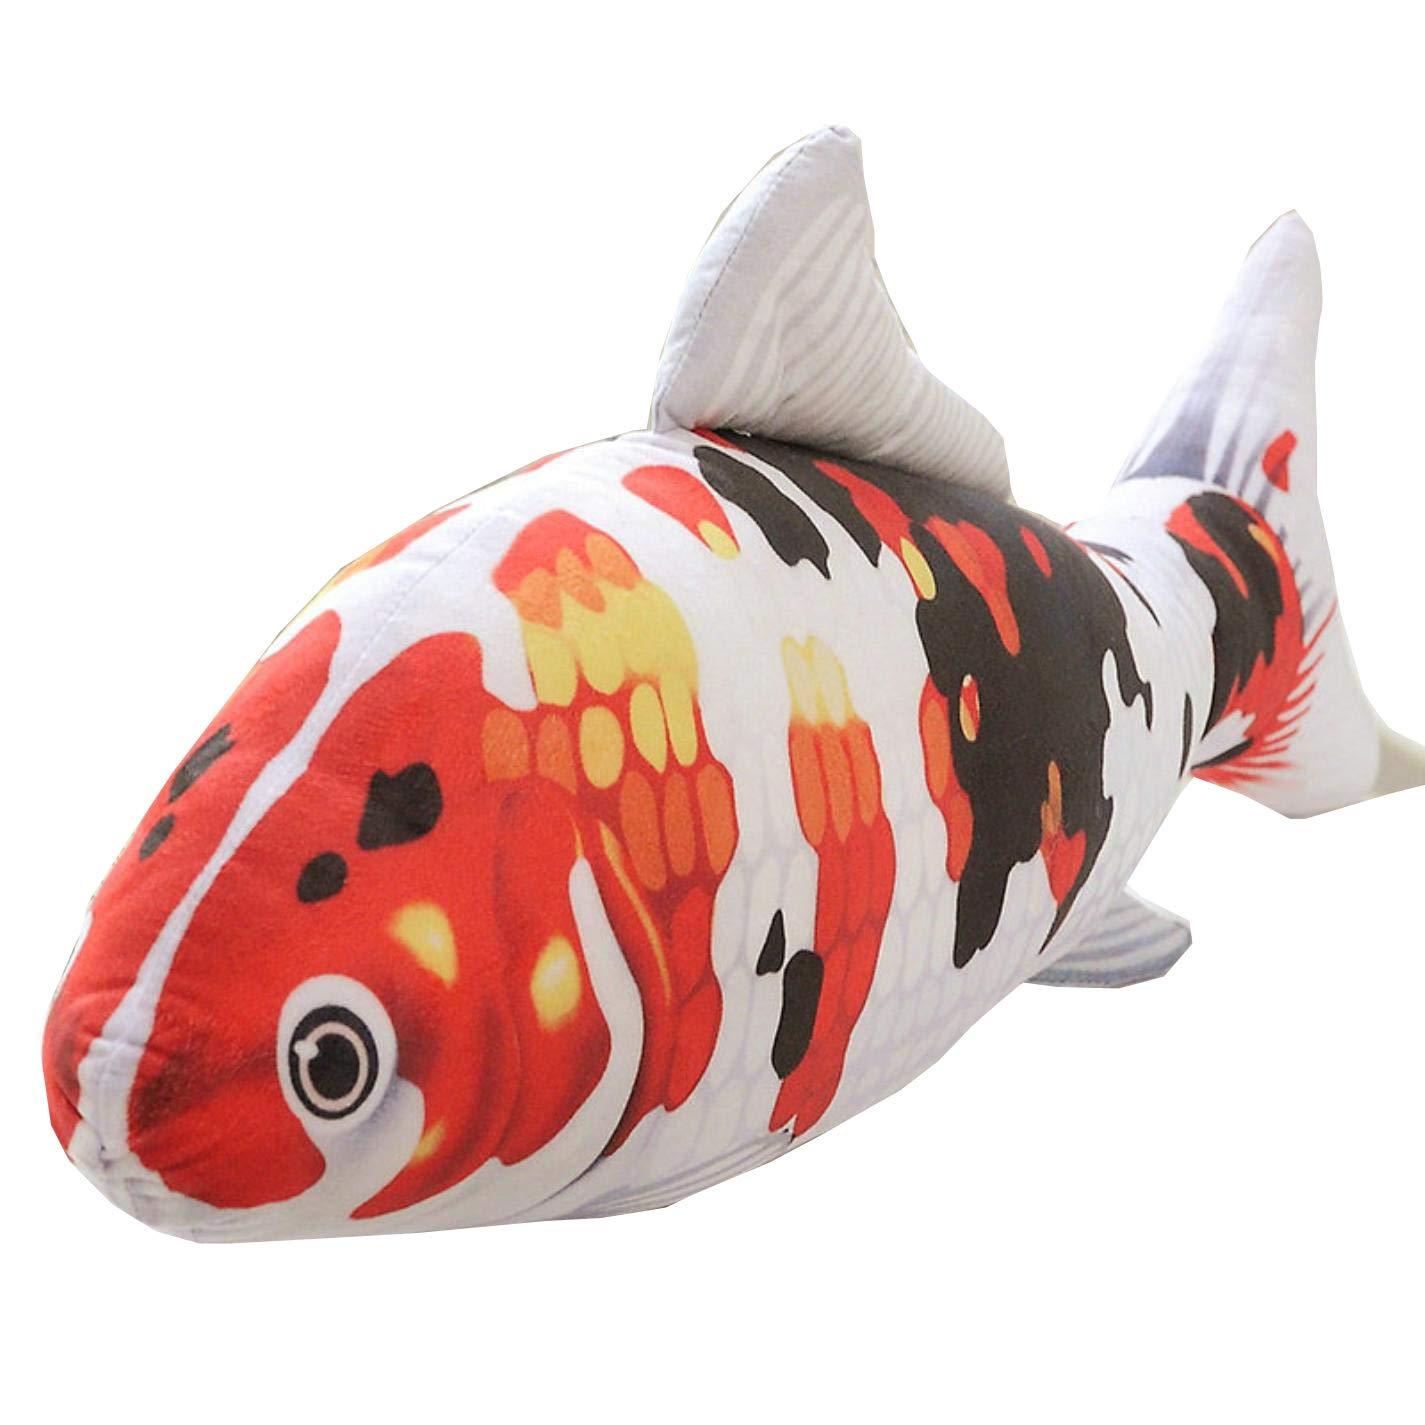 140cm Toy Fish Koi Carp Plush Toy Lifelike Stuffed Aquatic Fishes by Awooi